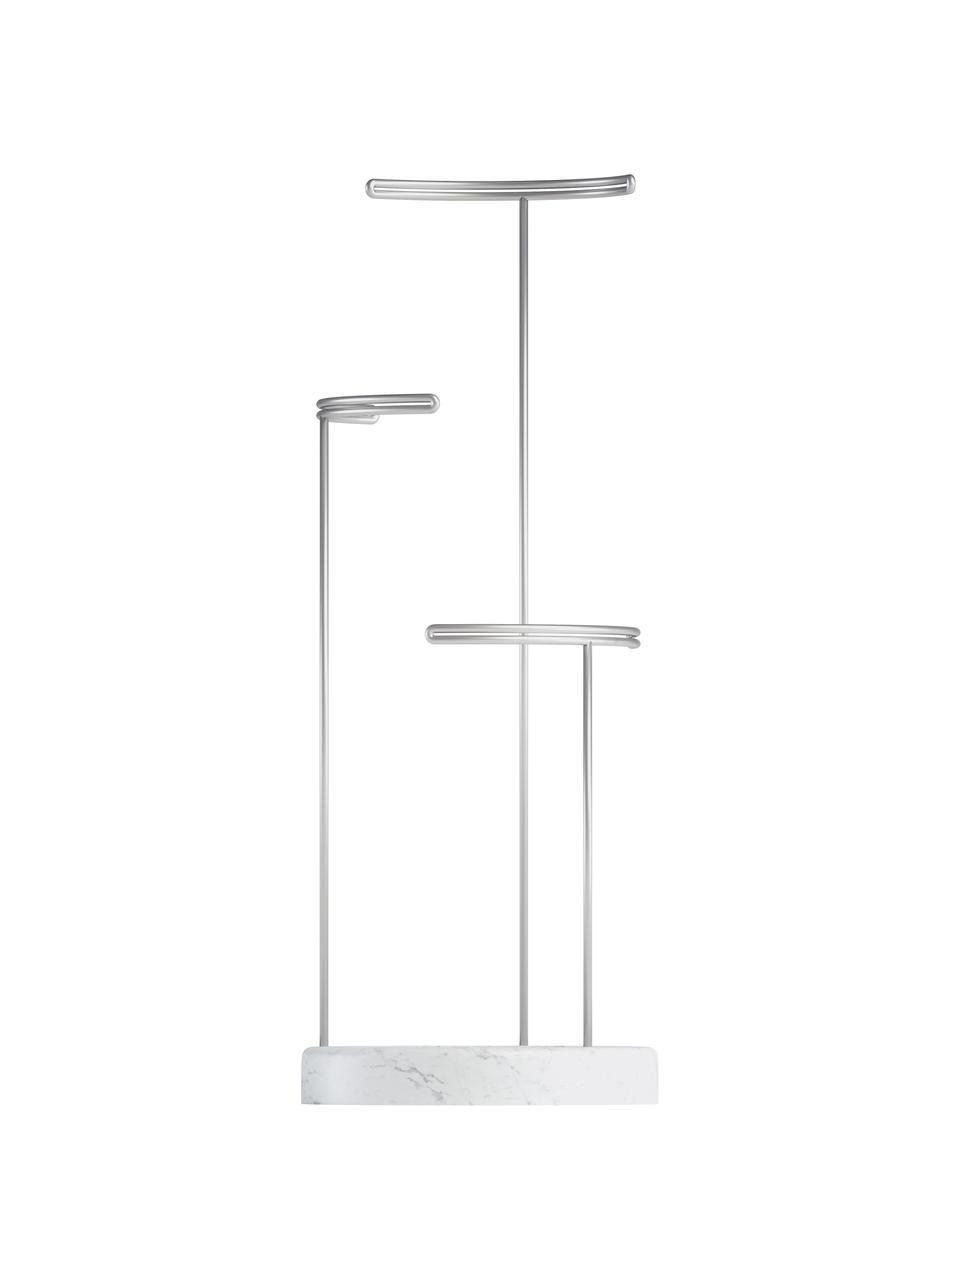 Schmuckhalter Tesora, Sockel: Betonharz, Weiß, Nickel, Ø 15 x H 42 cm